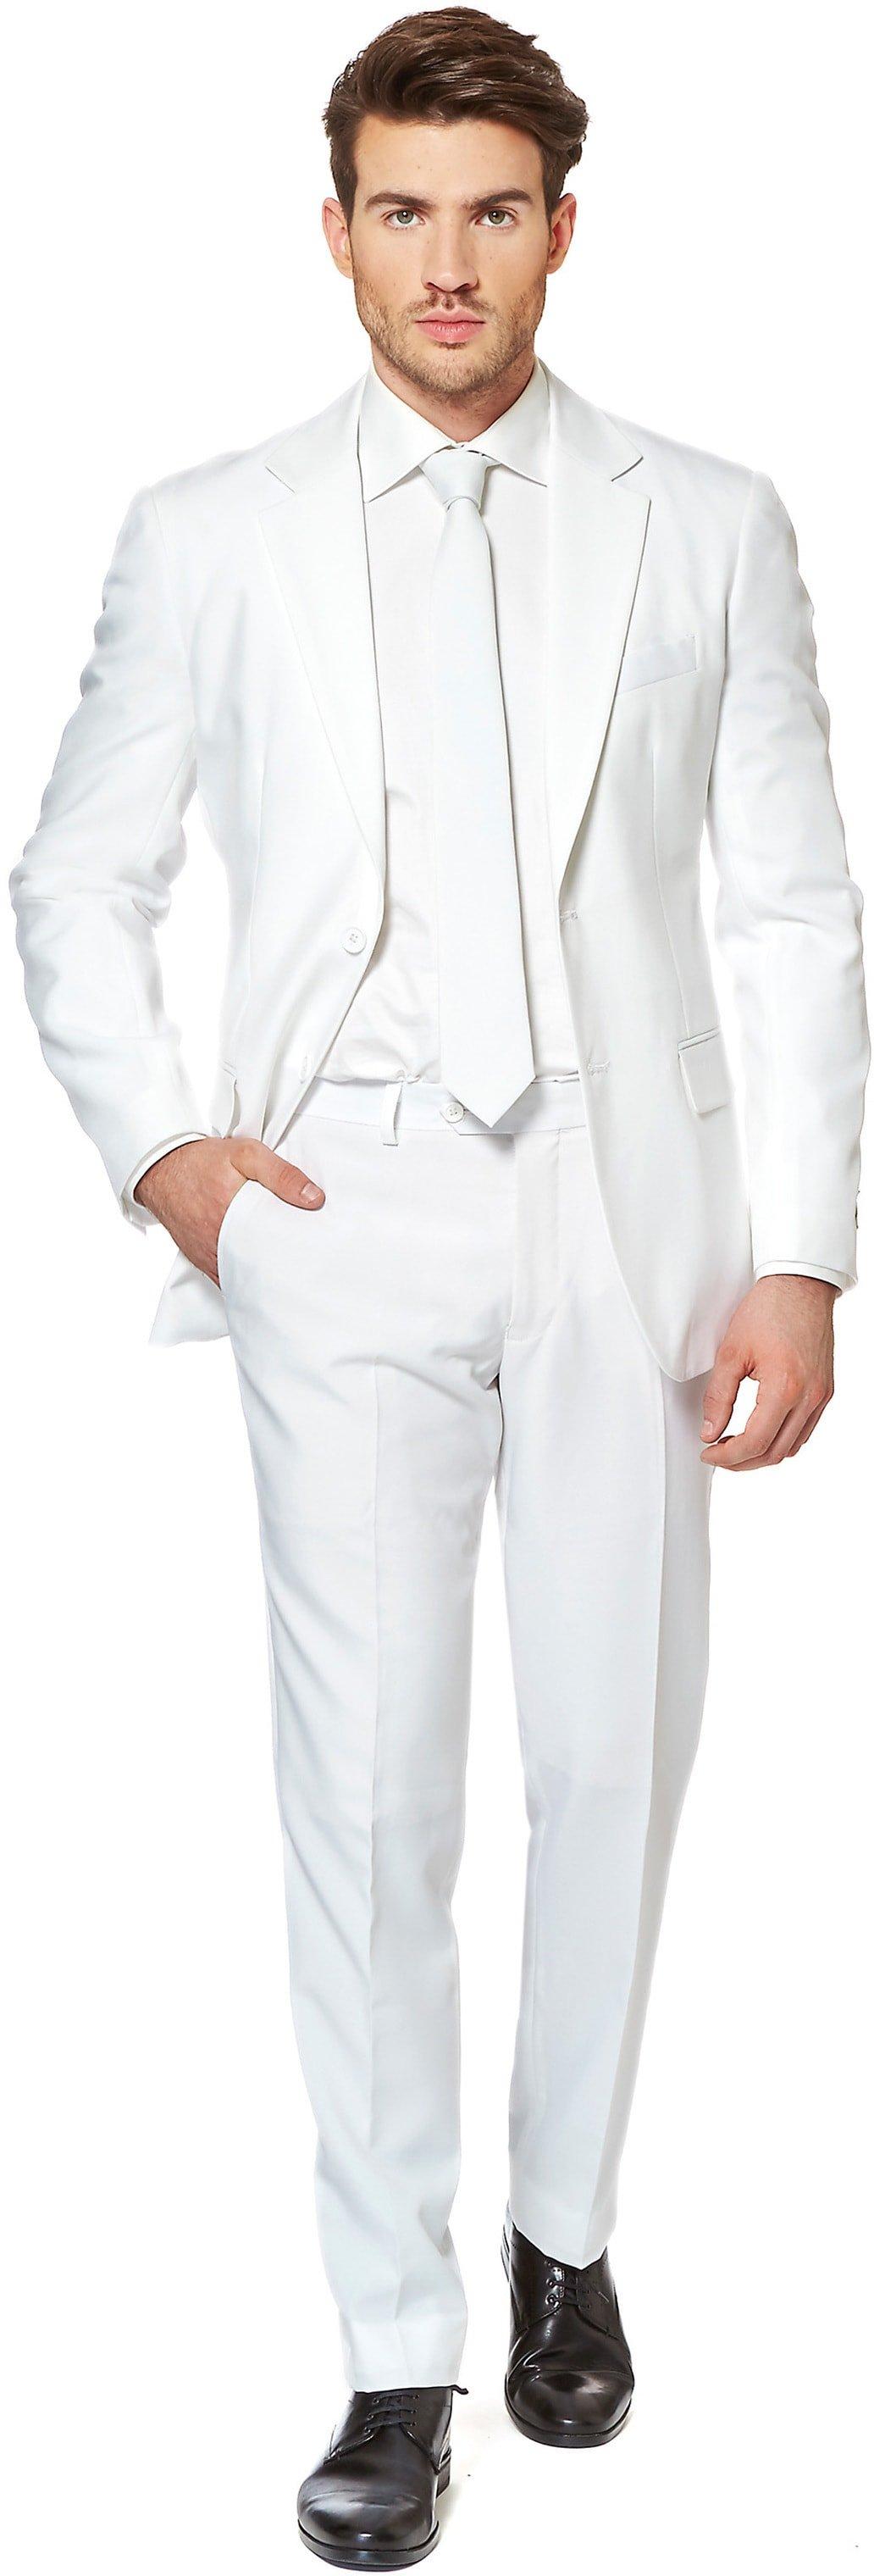 OppoSuits White Knight Kostuum foto 0